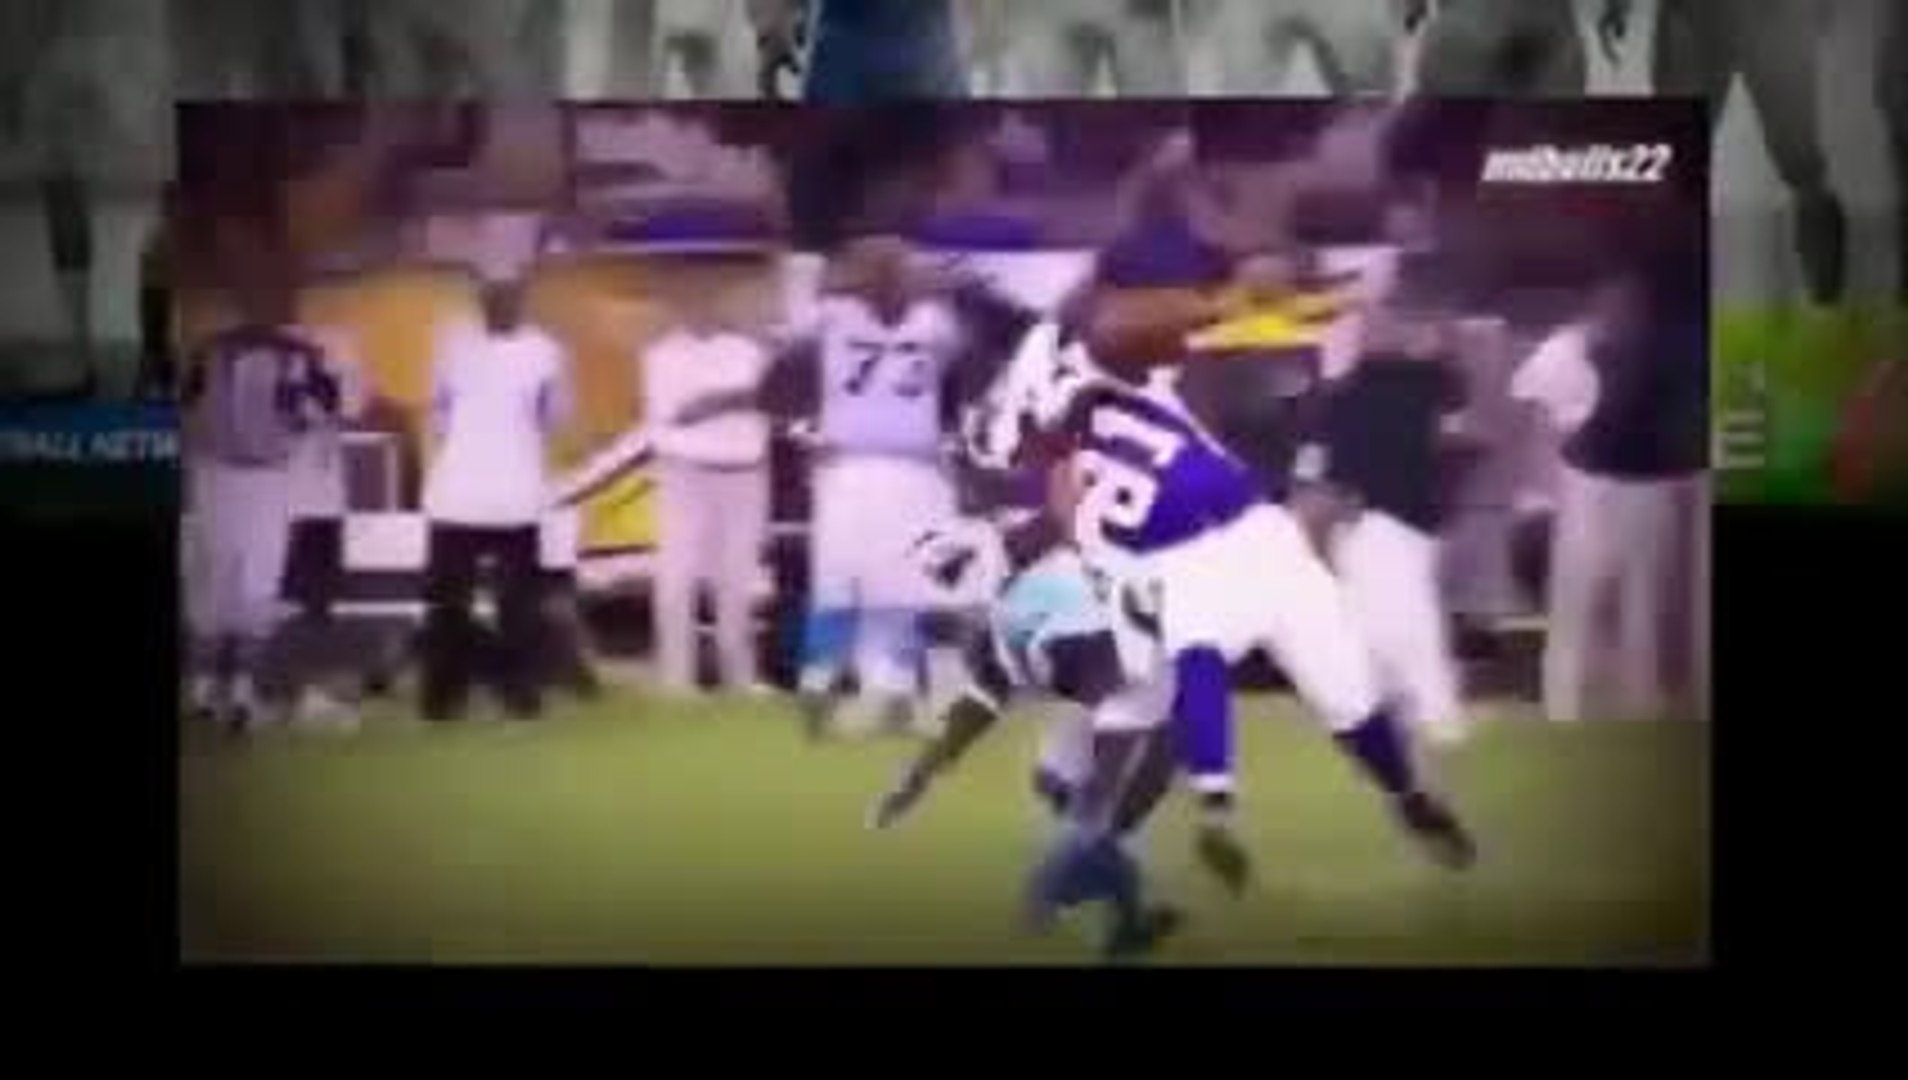 Redskins v Eagles 2014 highlights - live on sunday night - nfl football - tv on sunday night - sunda